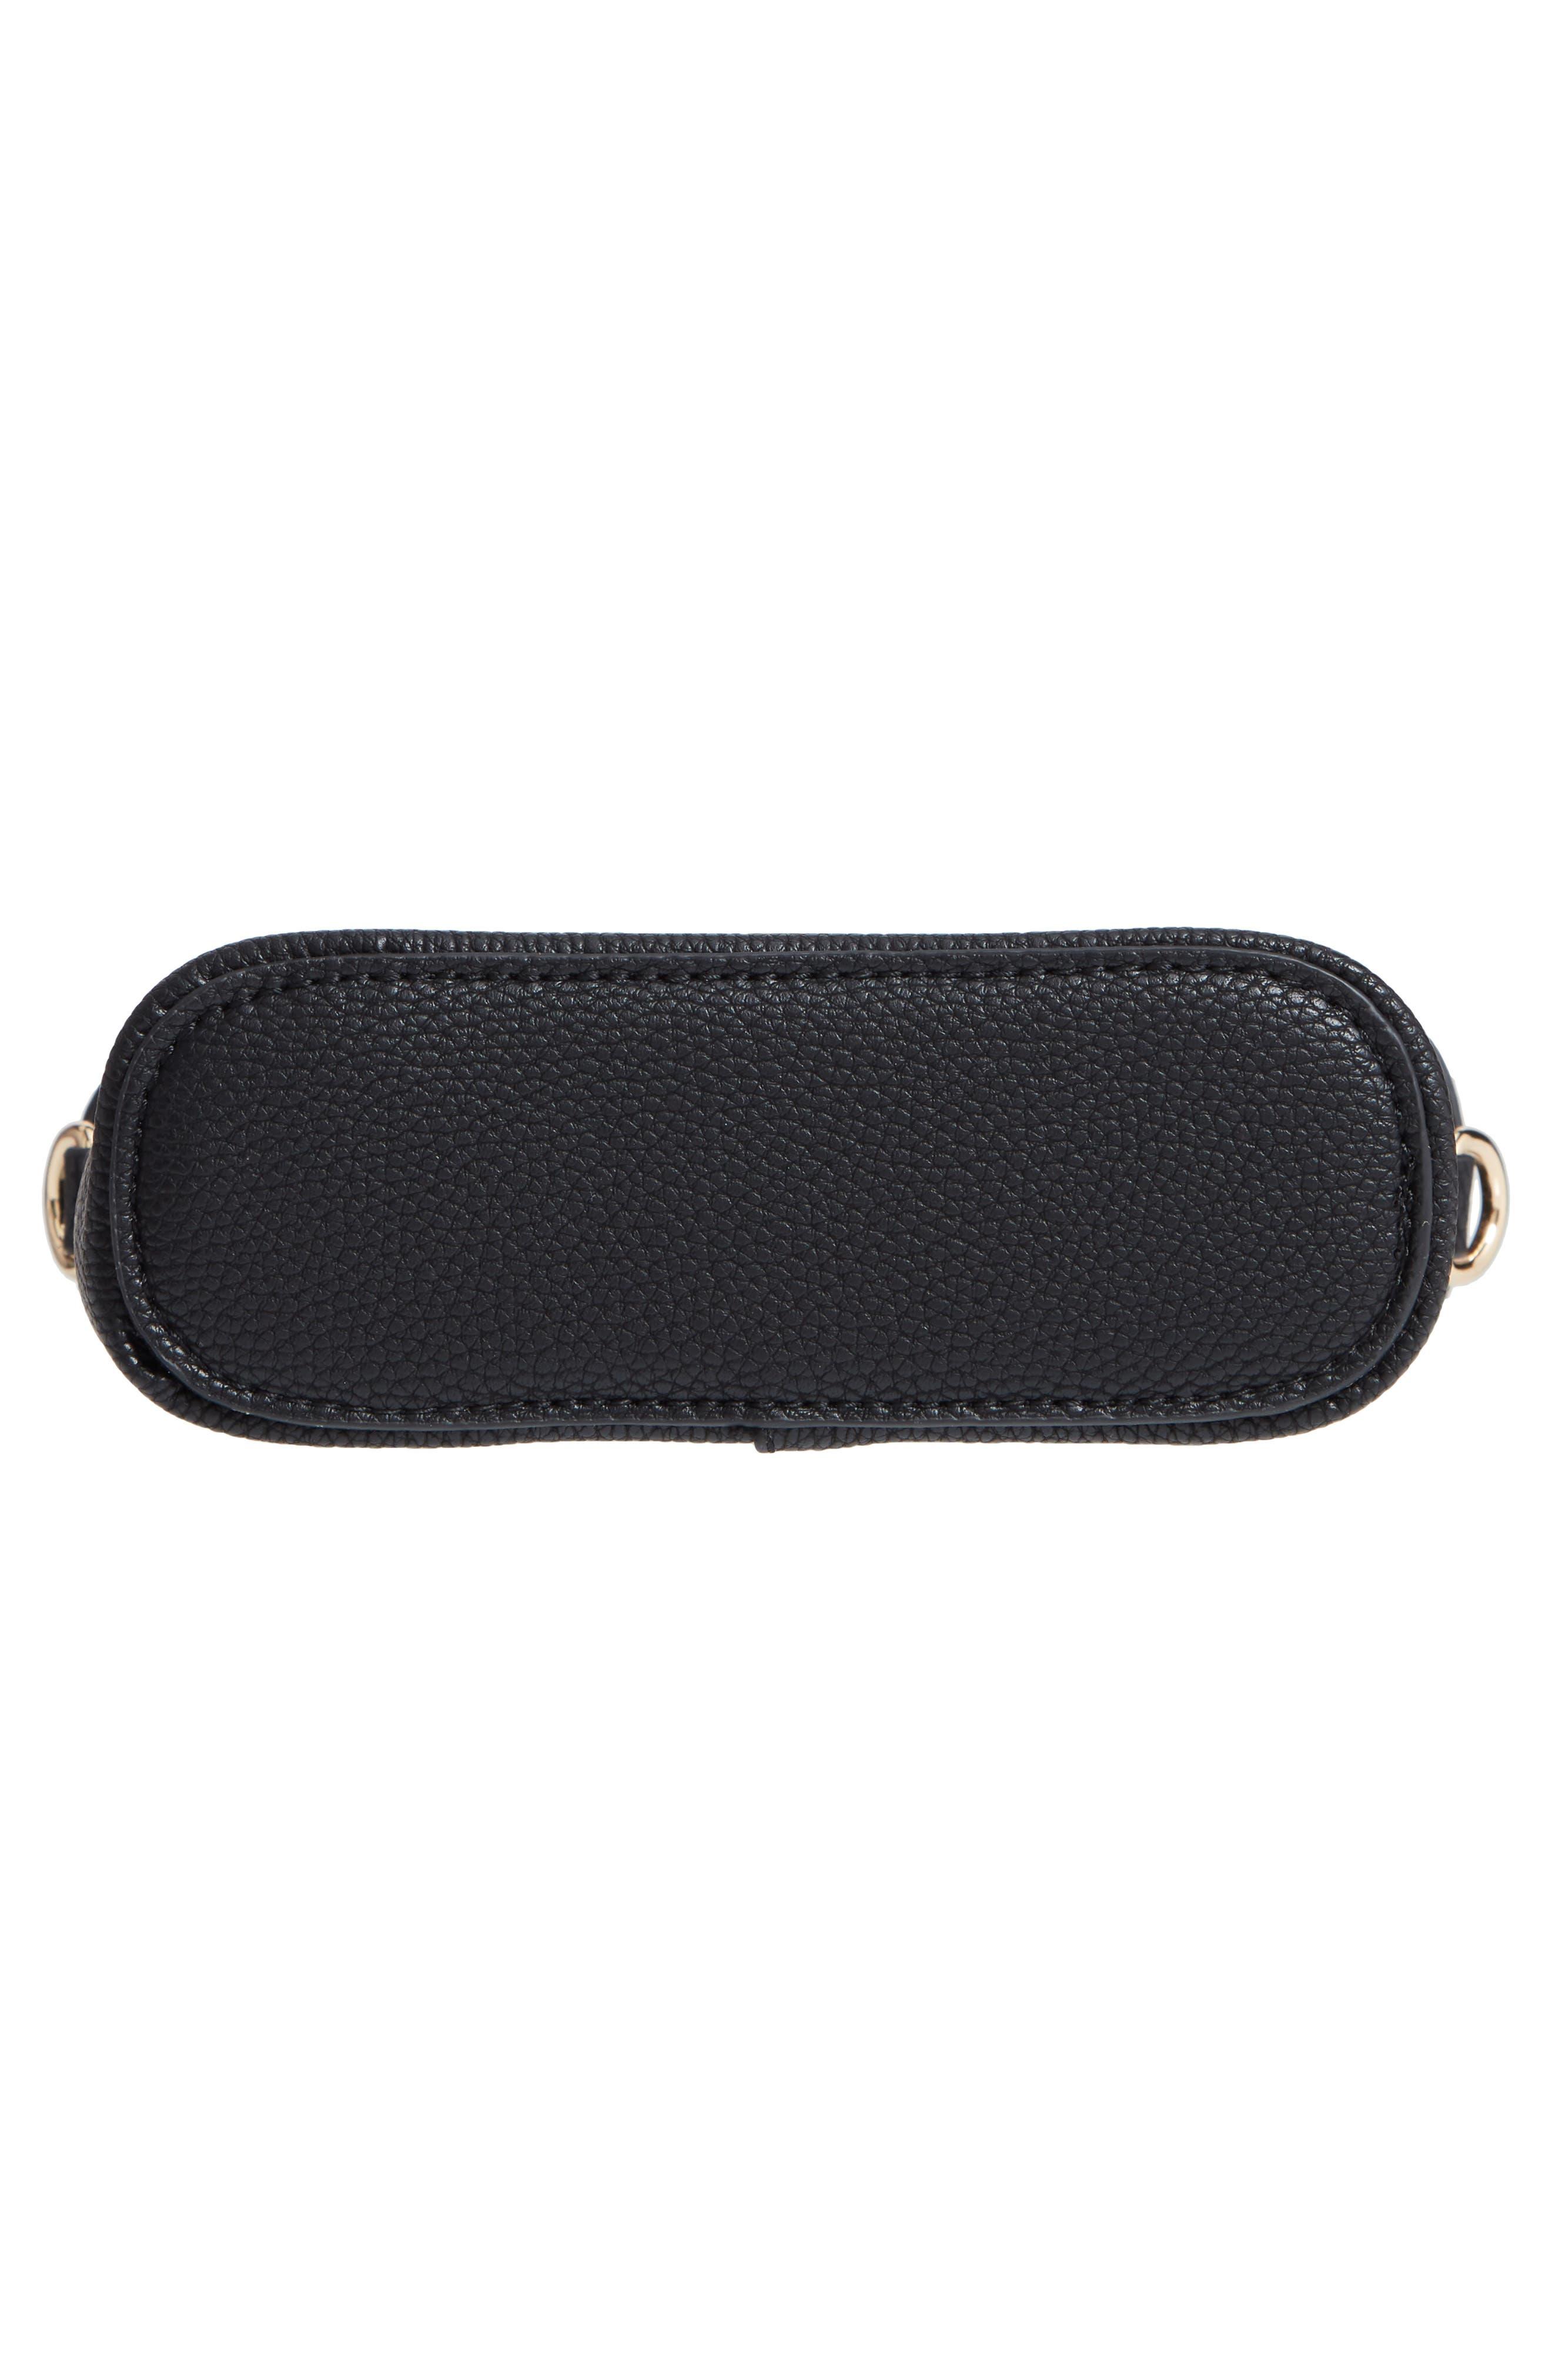 Lindsey Faux Leather Crossbody Bag,                             Alternate thumbnail 6, color,                             BLACK